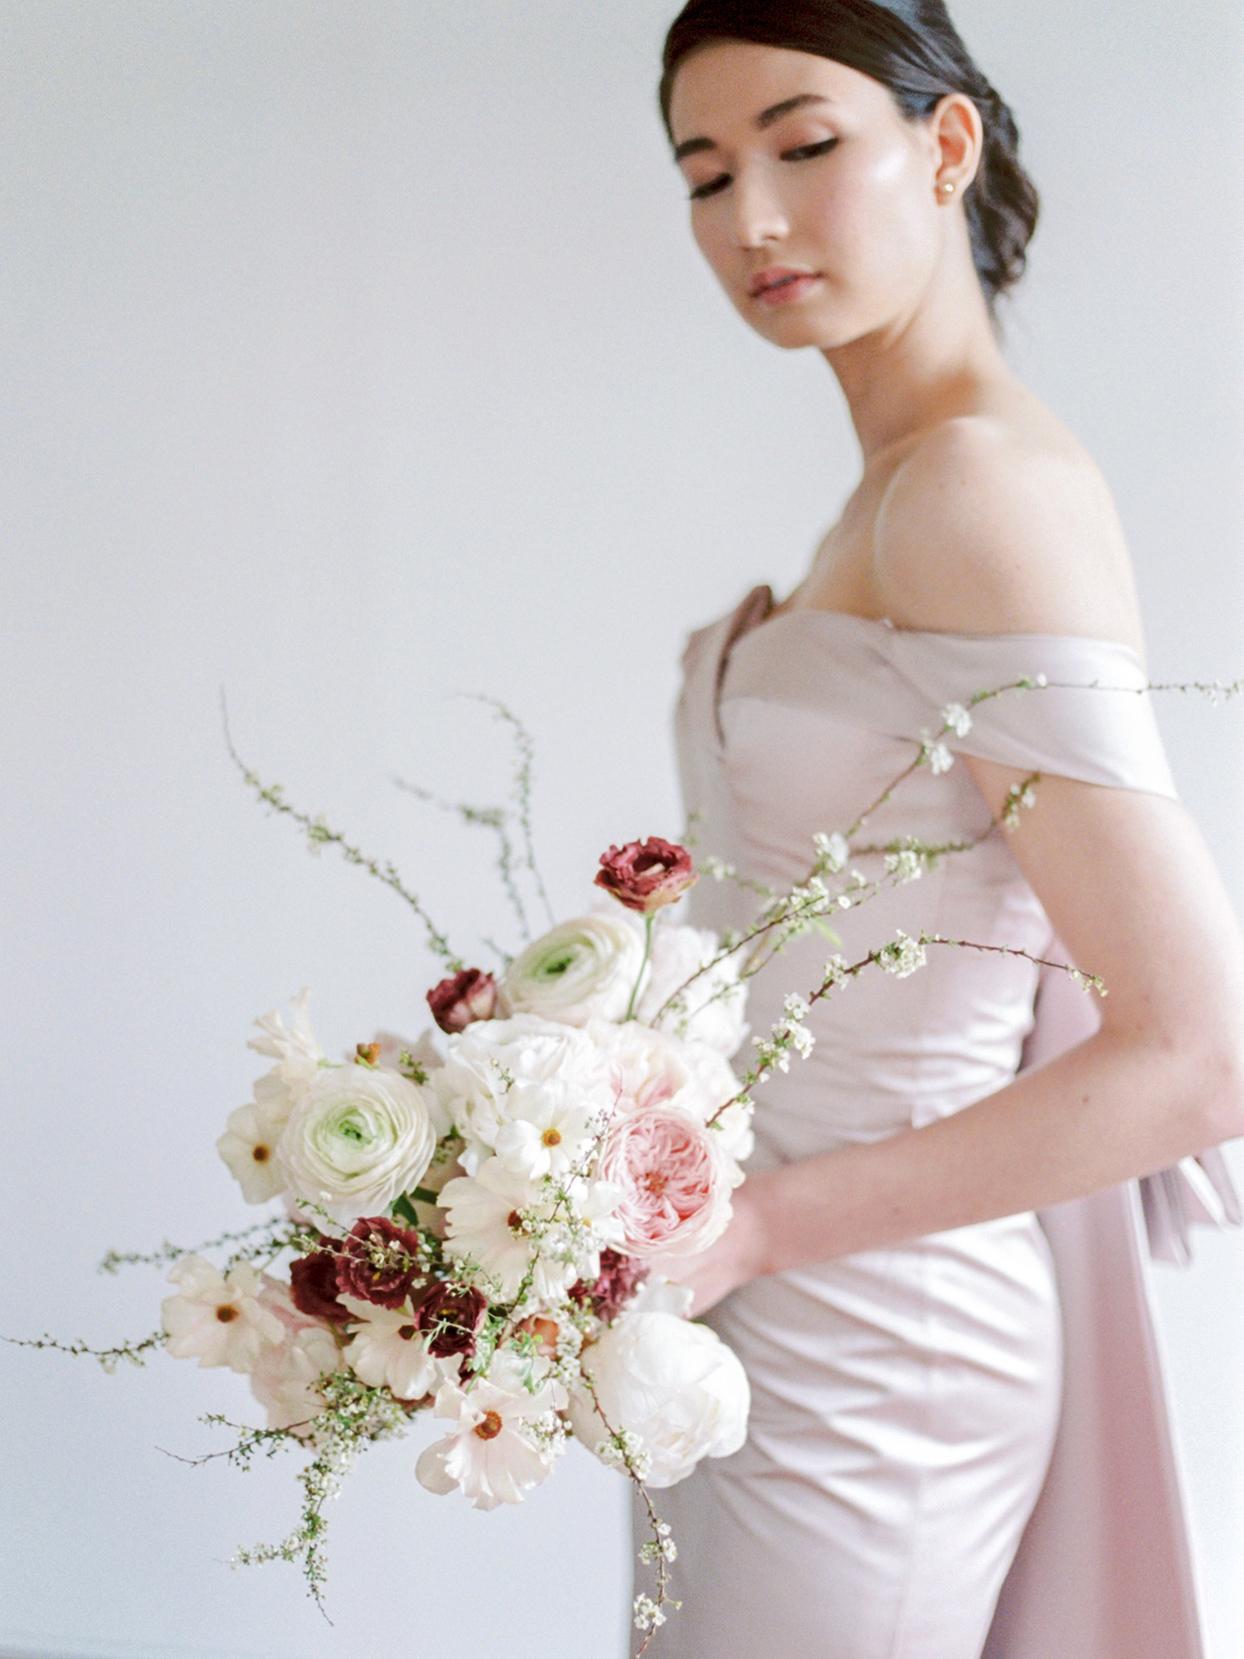 minimalist ikebana classic white and pink floral arrangement